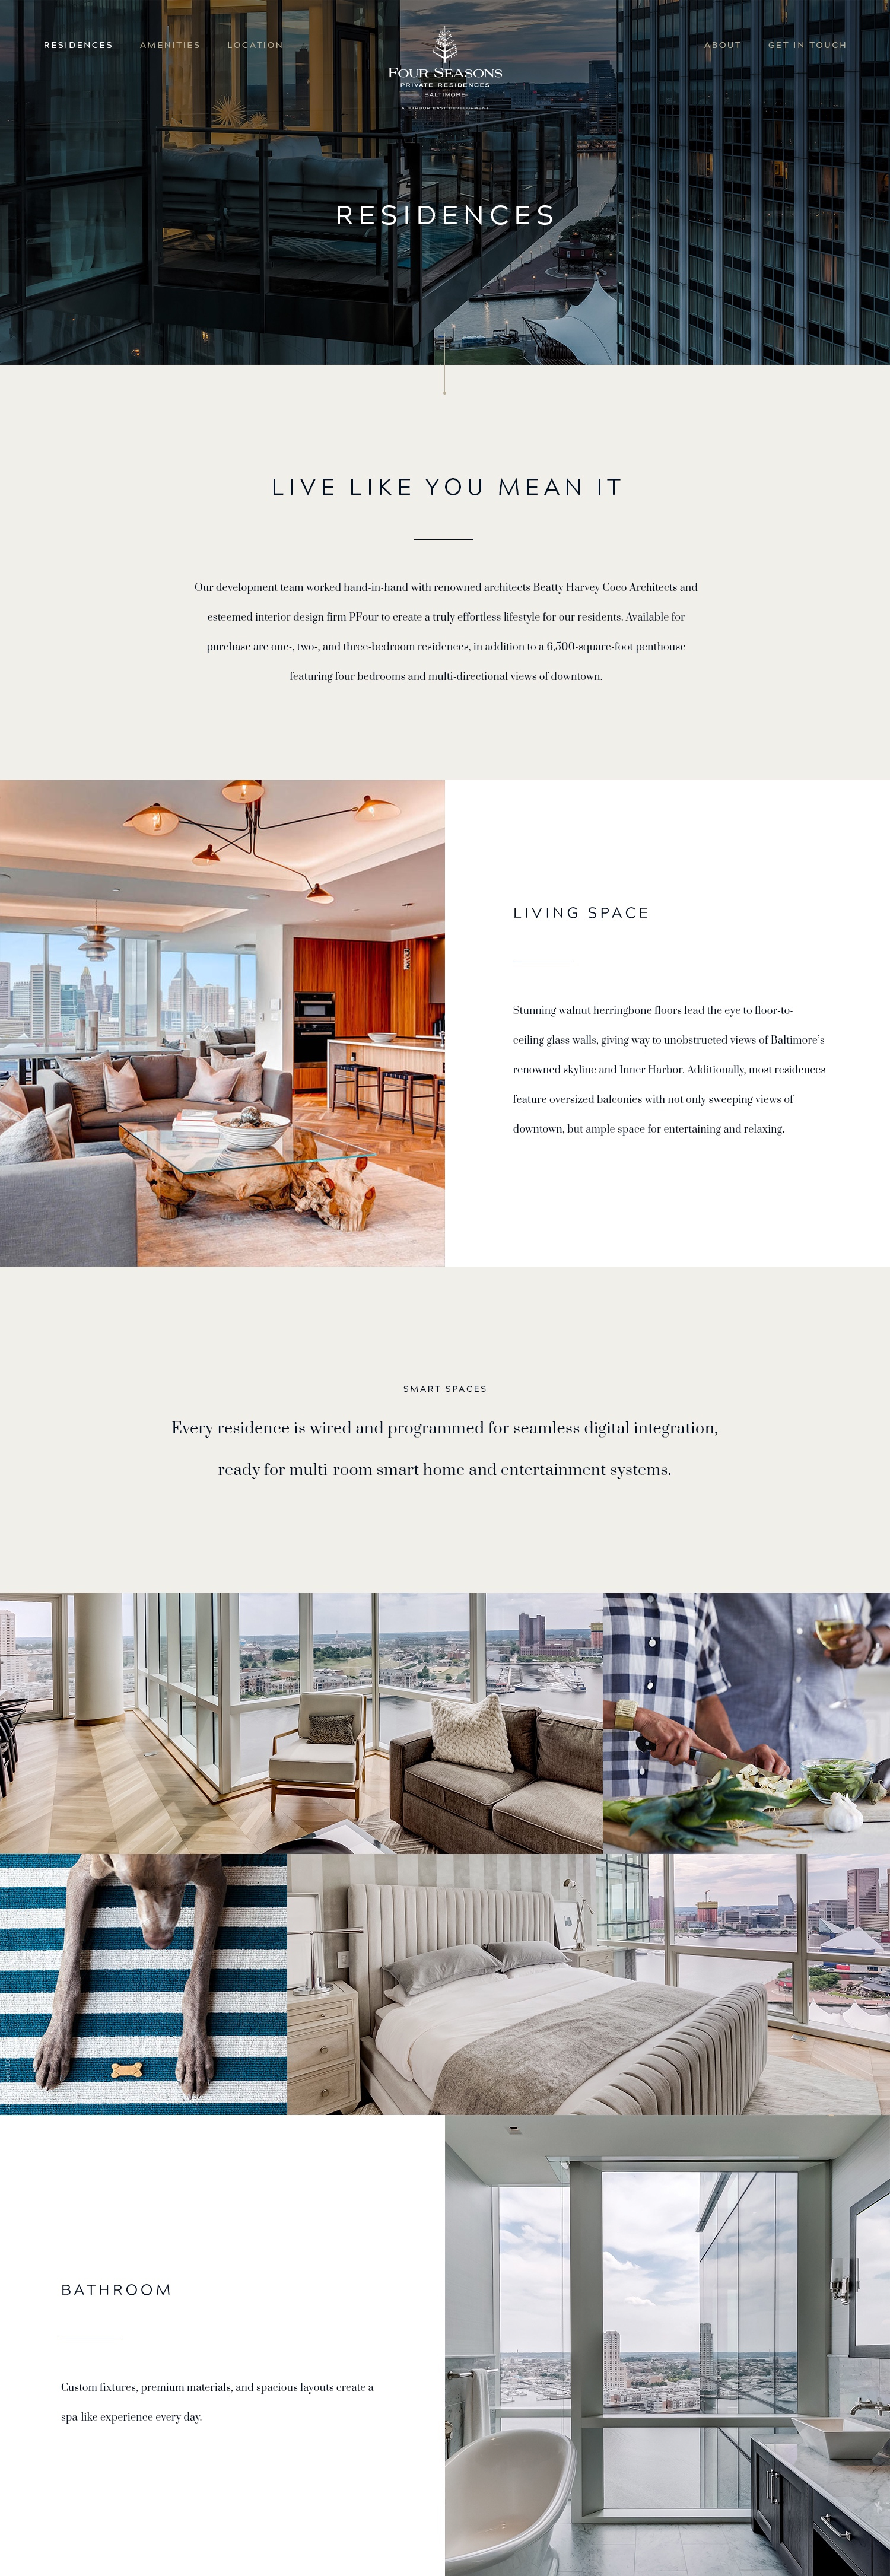 02 8537-Four-Seasons-Residences-1-23-18.jpg